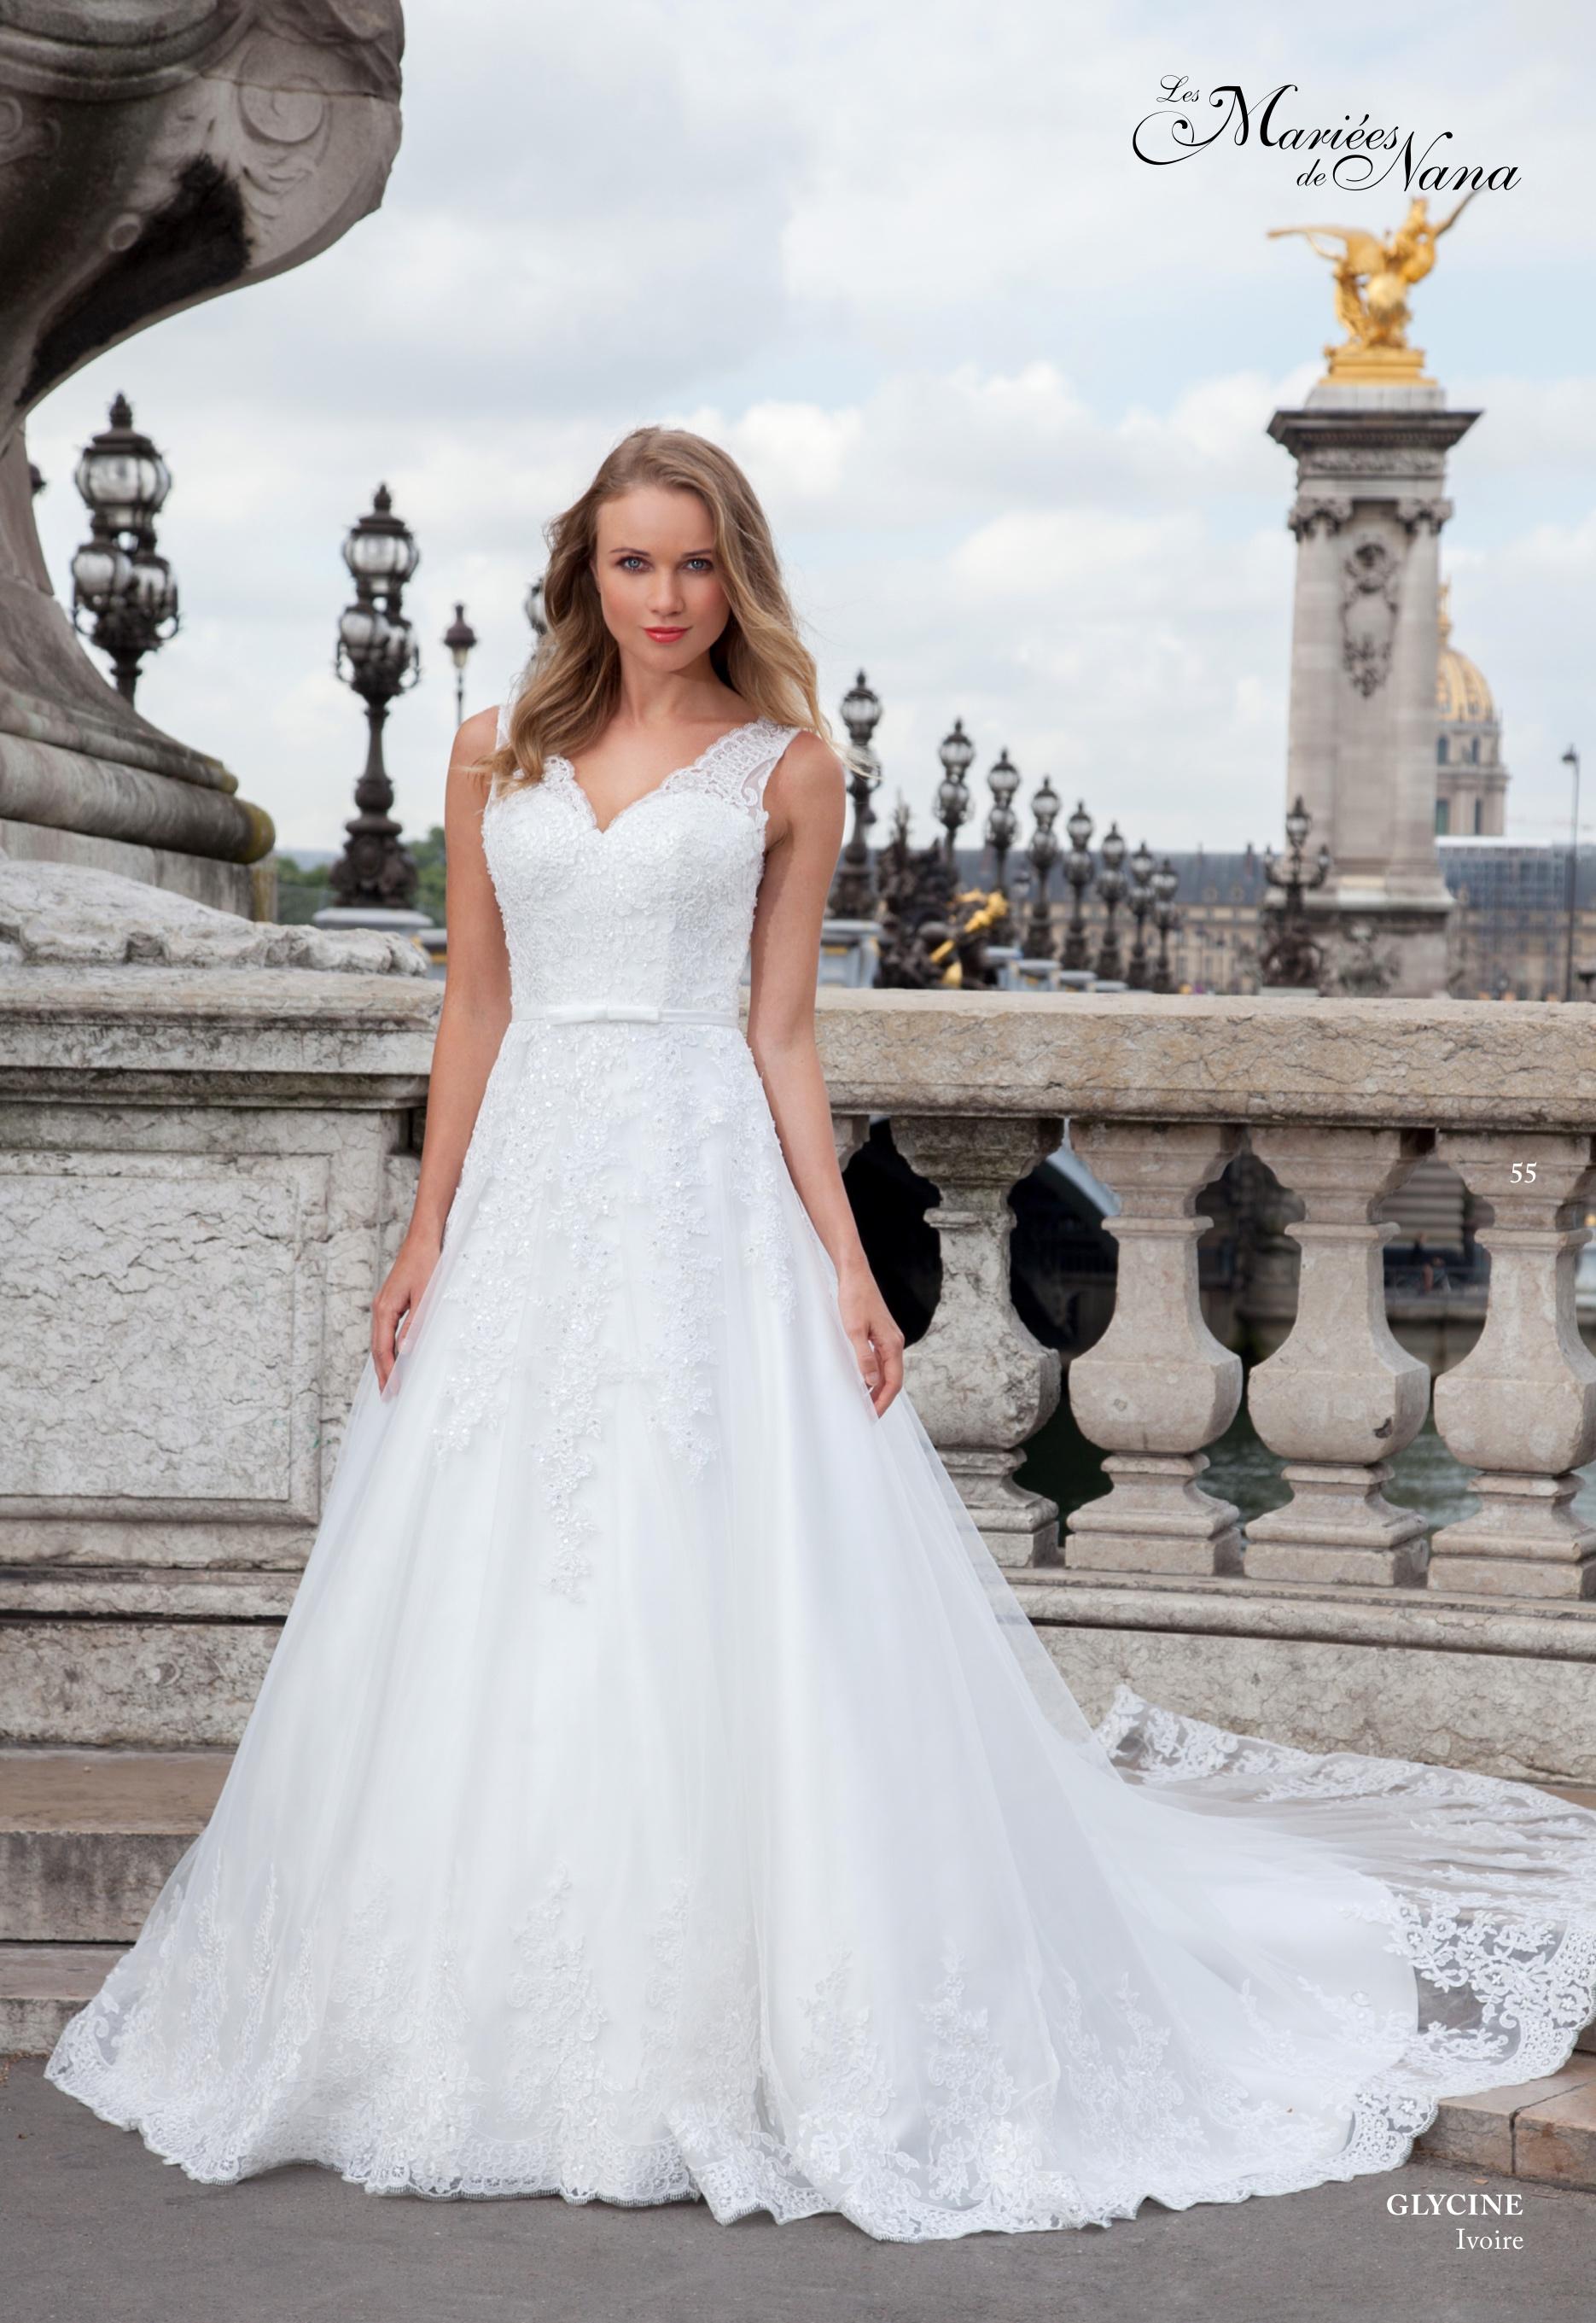 Robe de mariée Glycine - Les Mariées de Nana